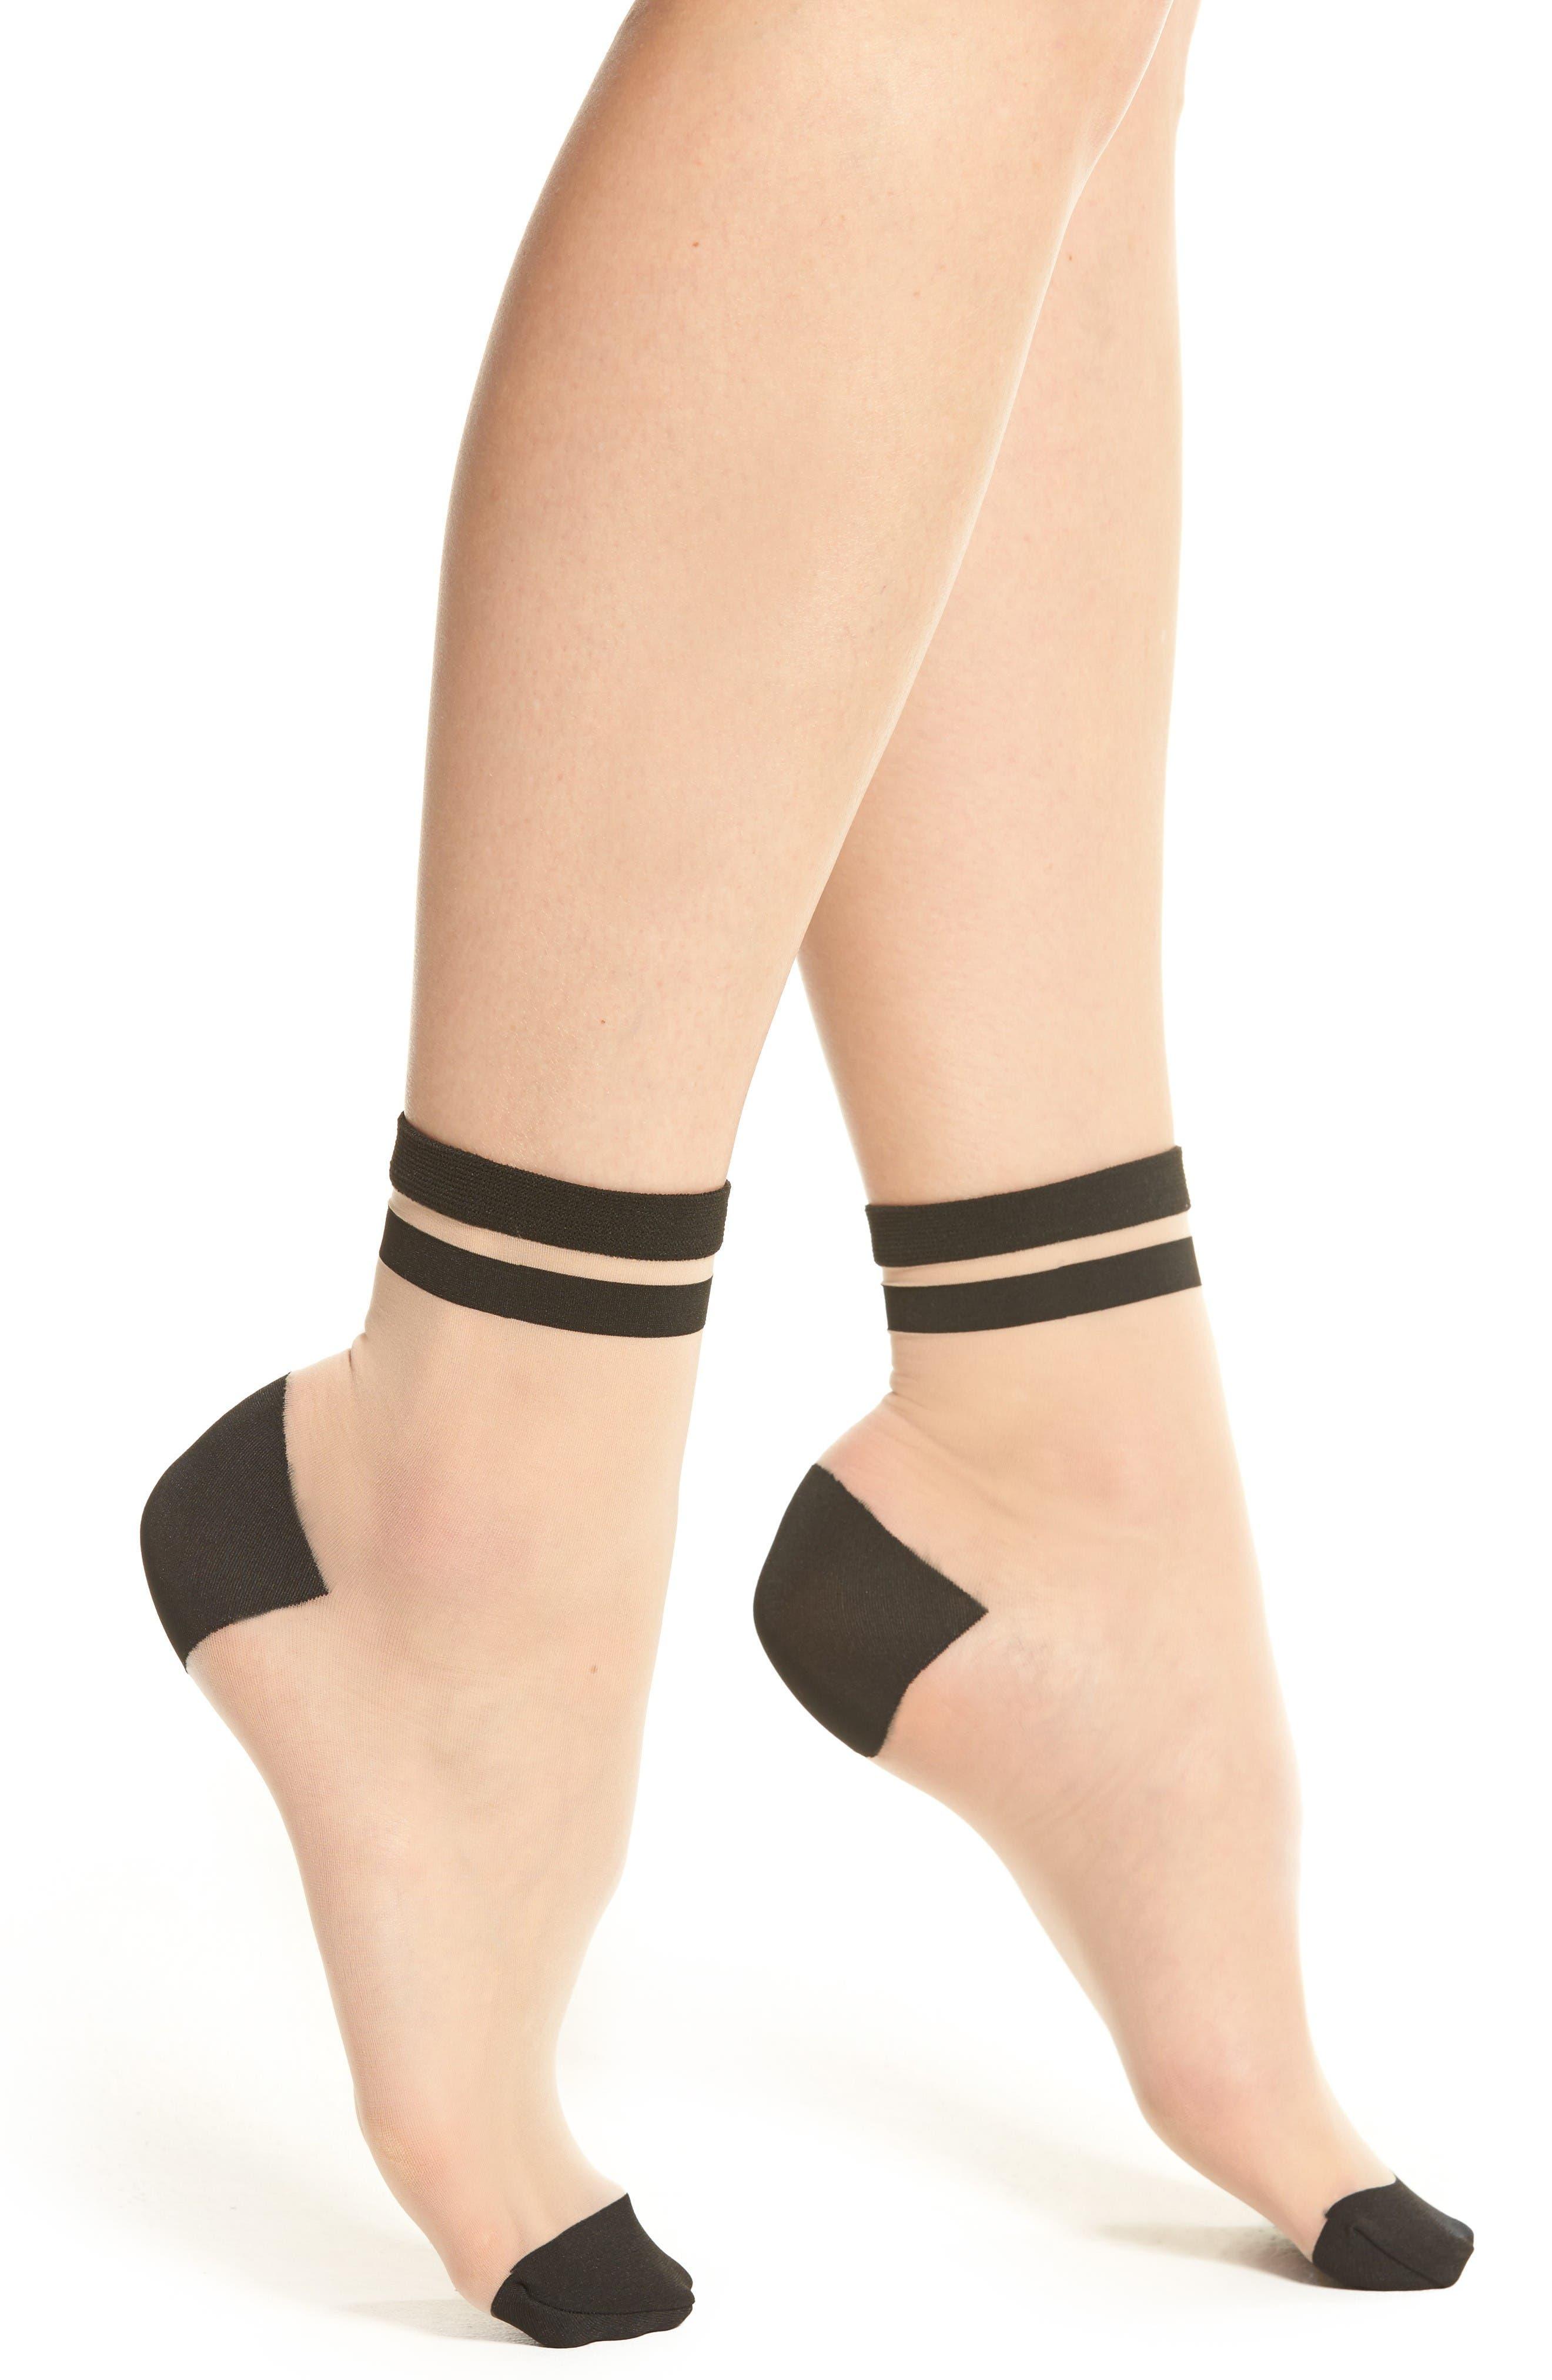 Main Image - DKNY 2-Pack Sheer Ankle Socks